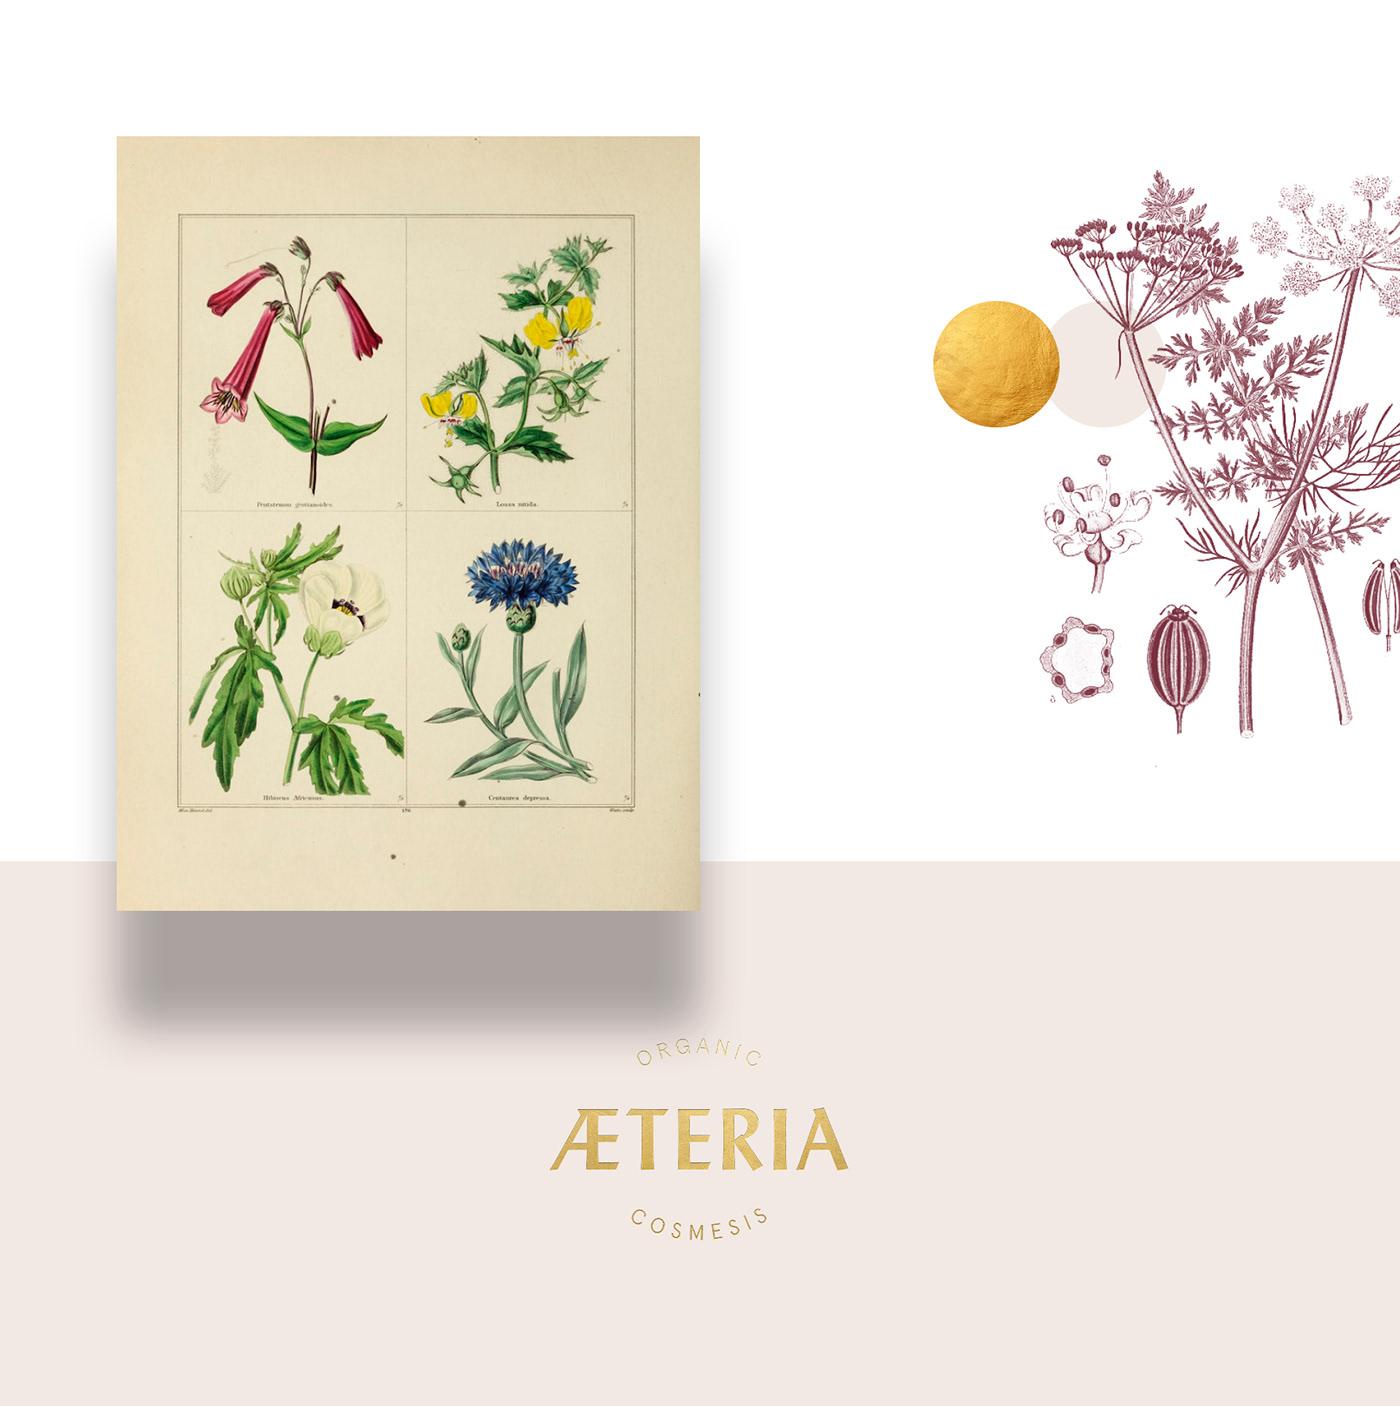 Packaging essential oils organic Cosmetic branding  Aeteria natural Nature Bergamot almond